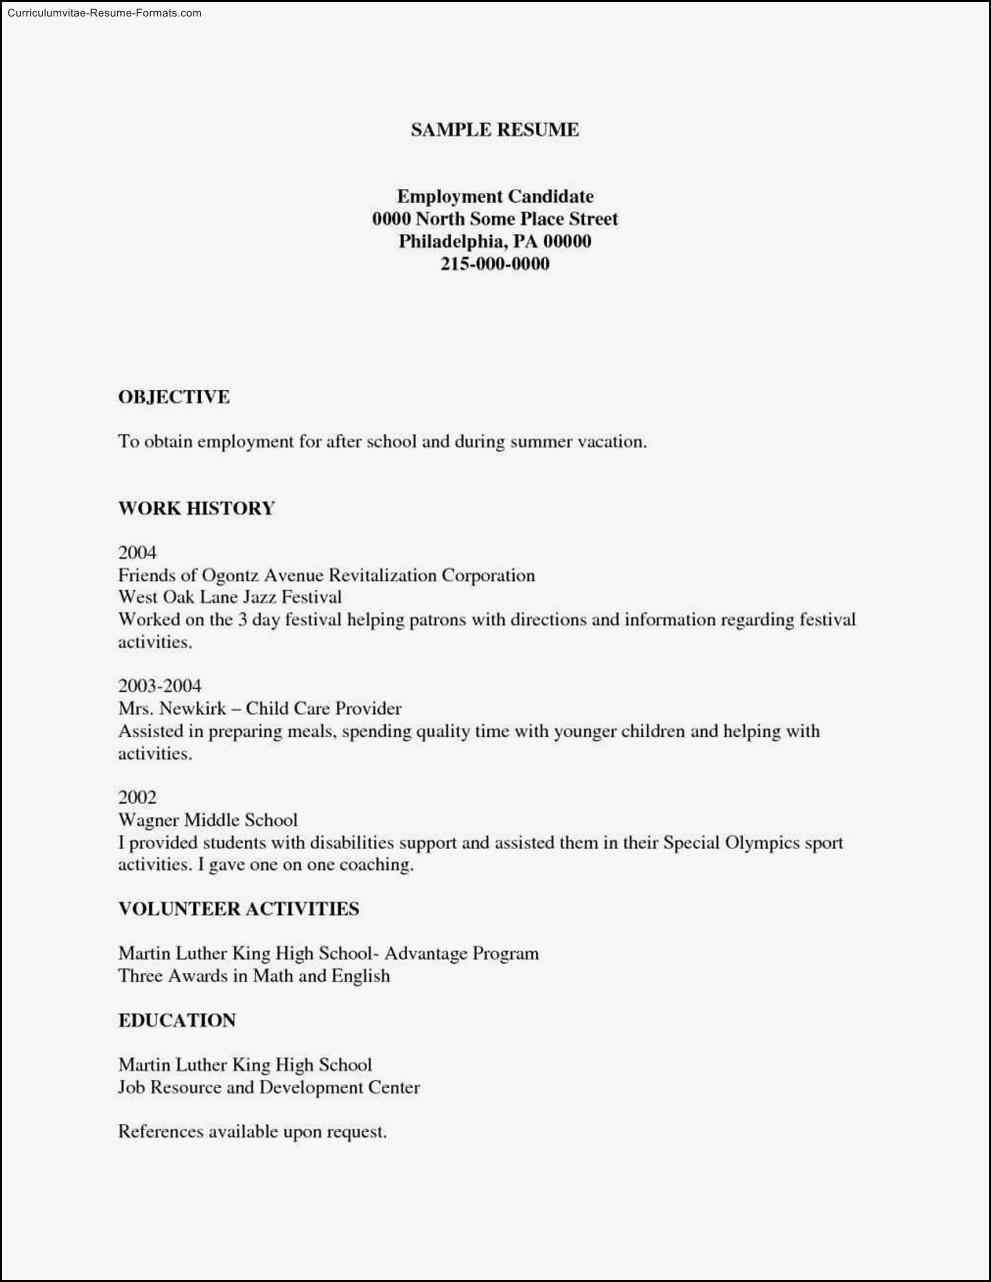 Free Printable Resume Templates | | Business Template And Resources - Free Printable Resume Templates